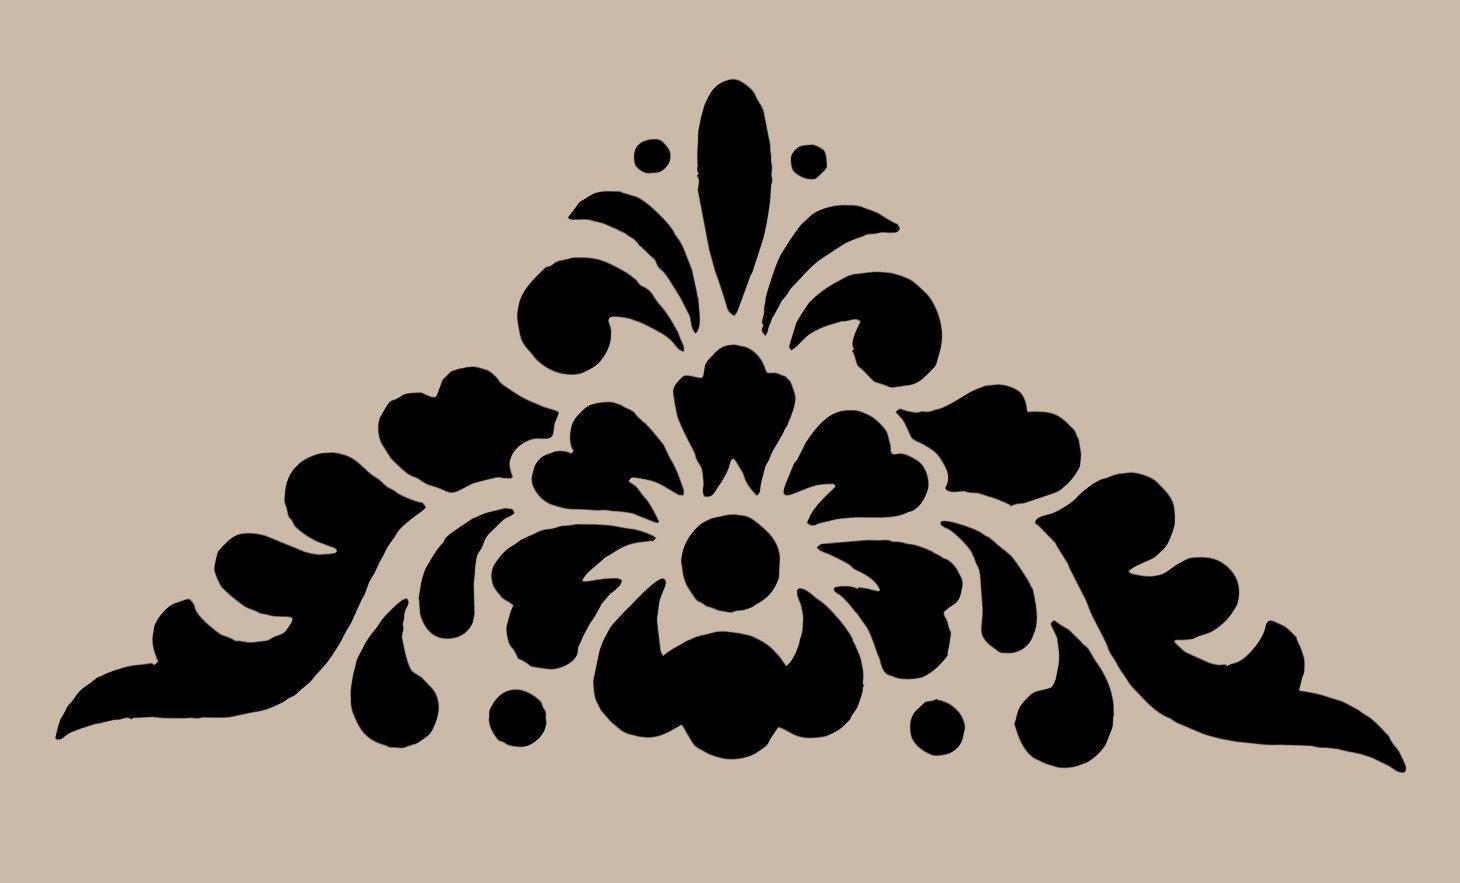 etsy policies template - stencil floral motif corner 10x9 7 by artisticstencils on etsy